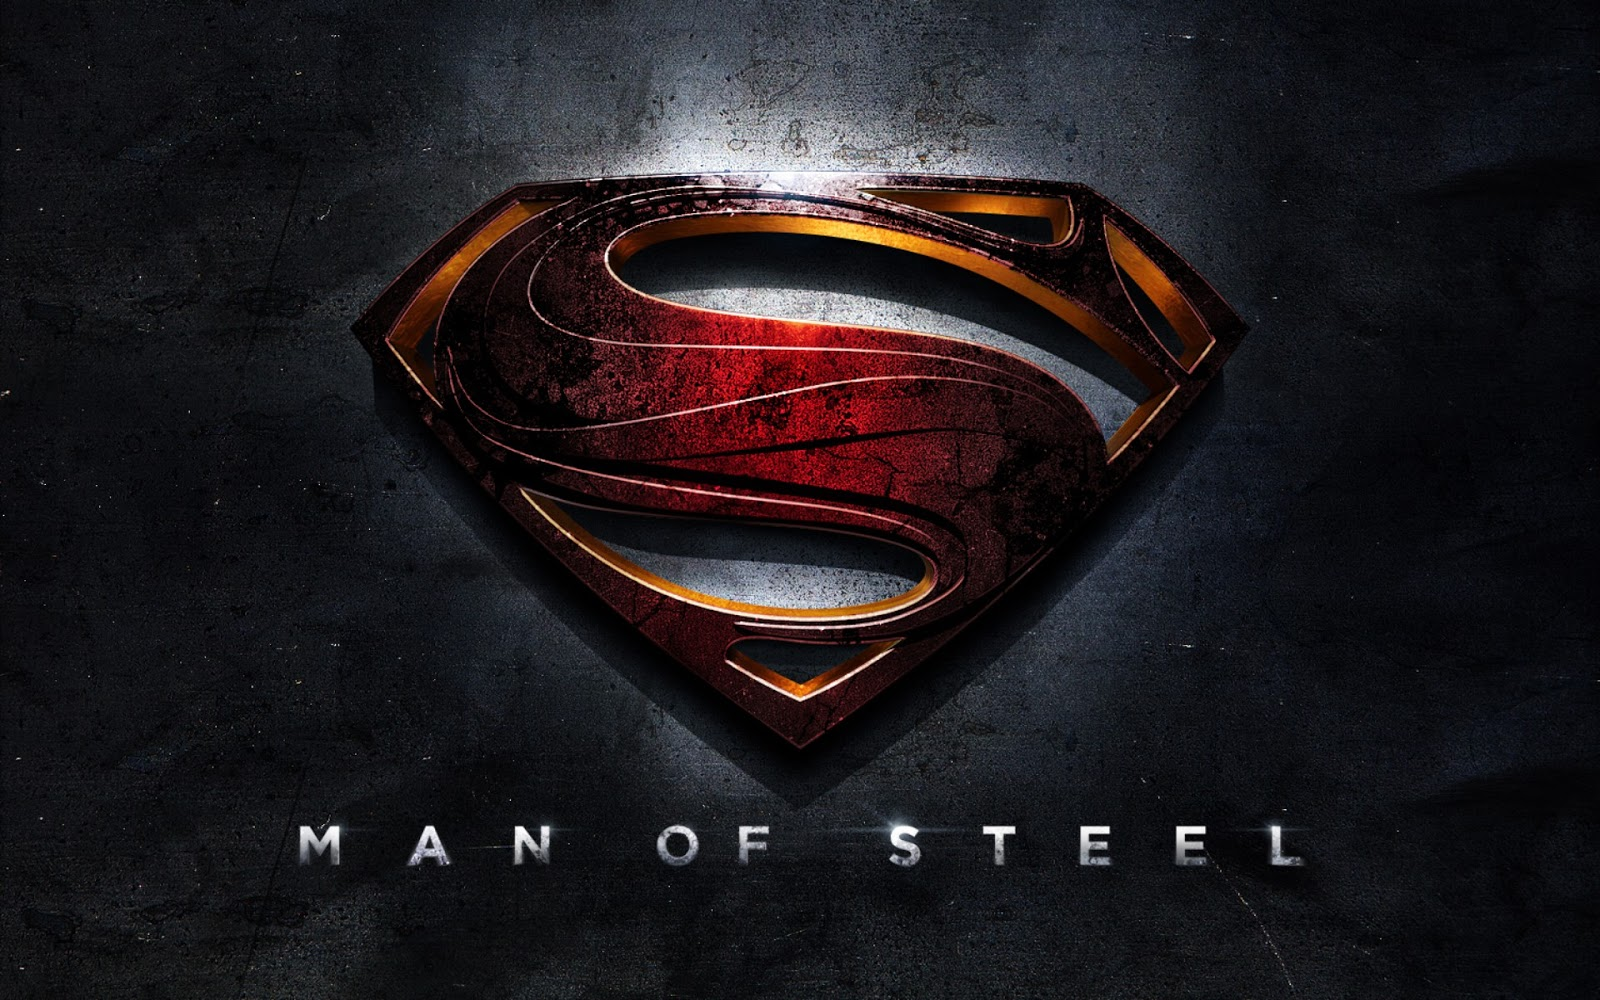 954 man of steel red red hot head 954 man of steel voltagebd Choice Image